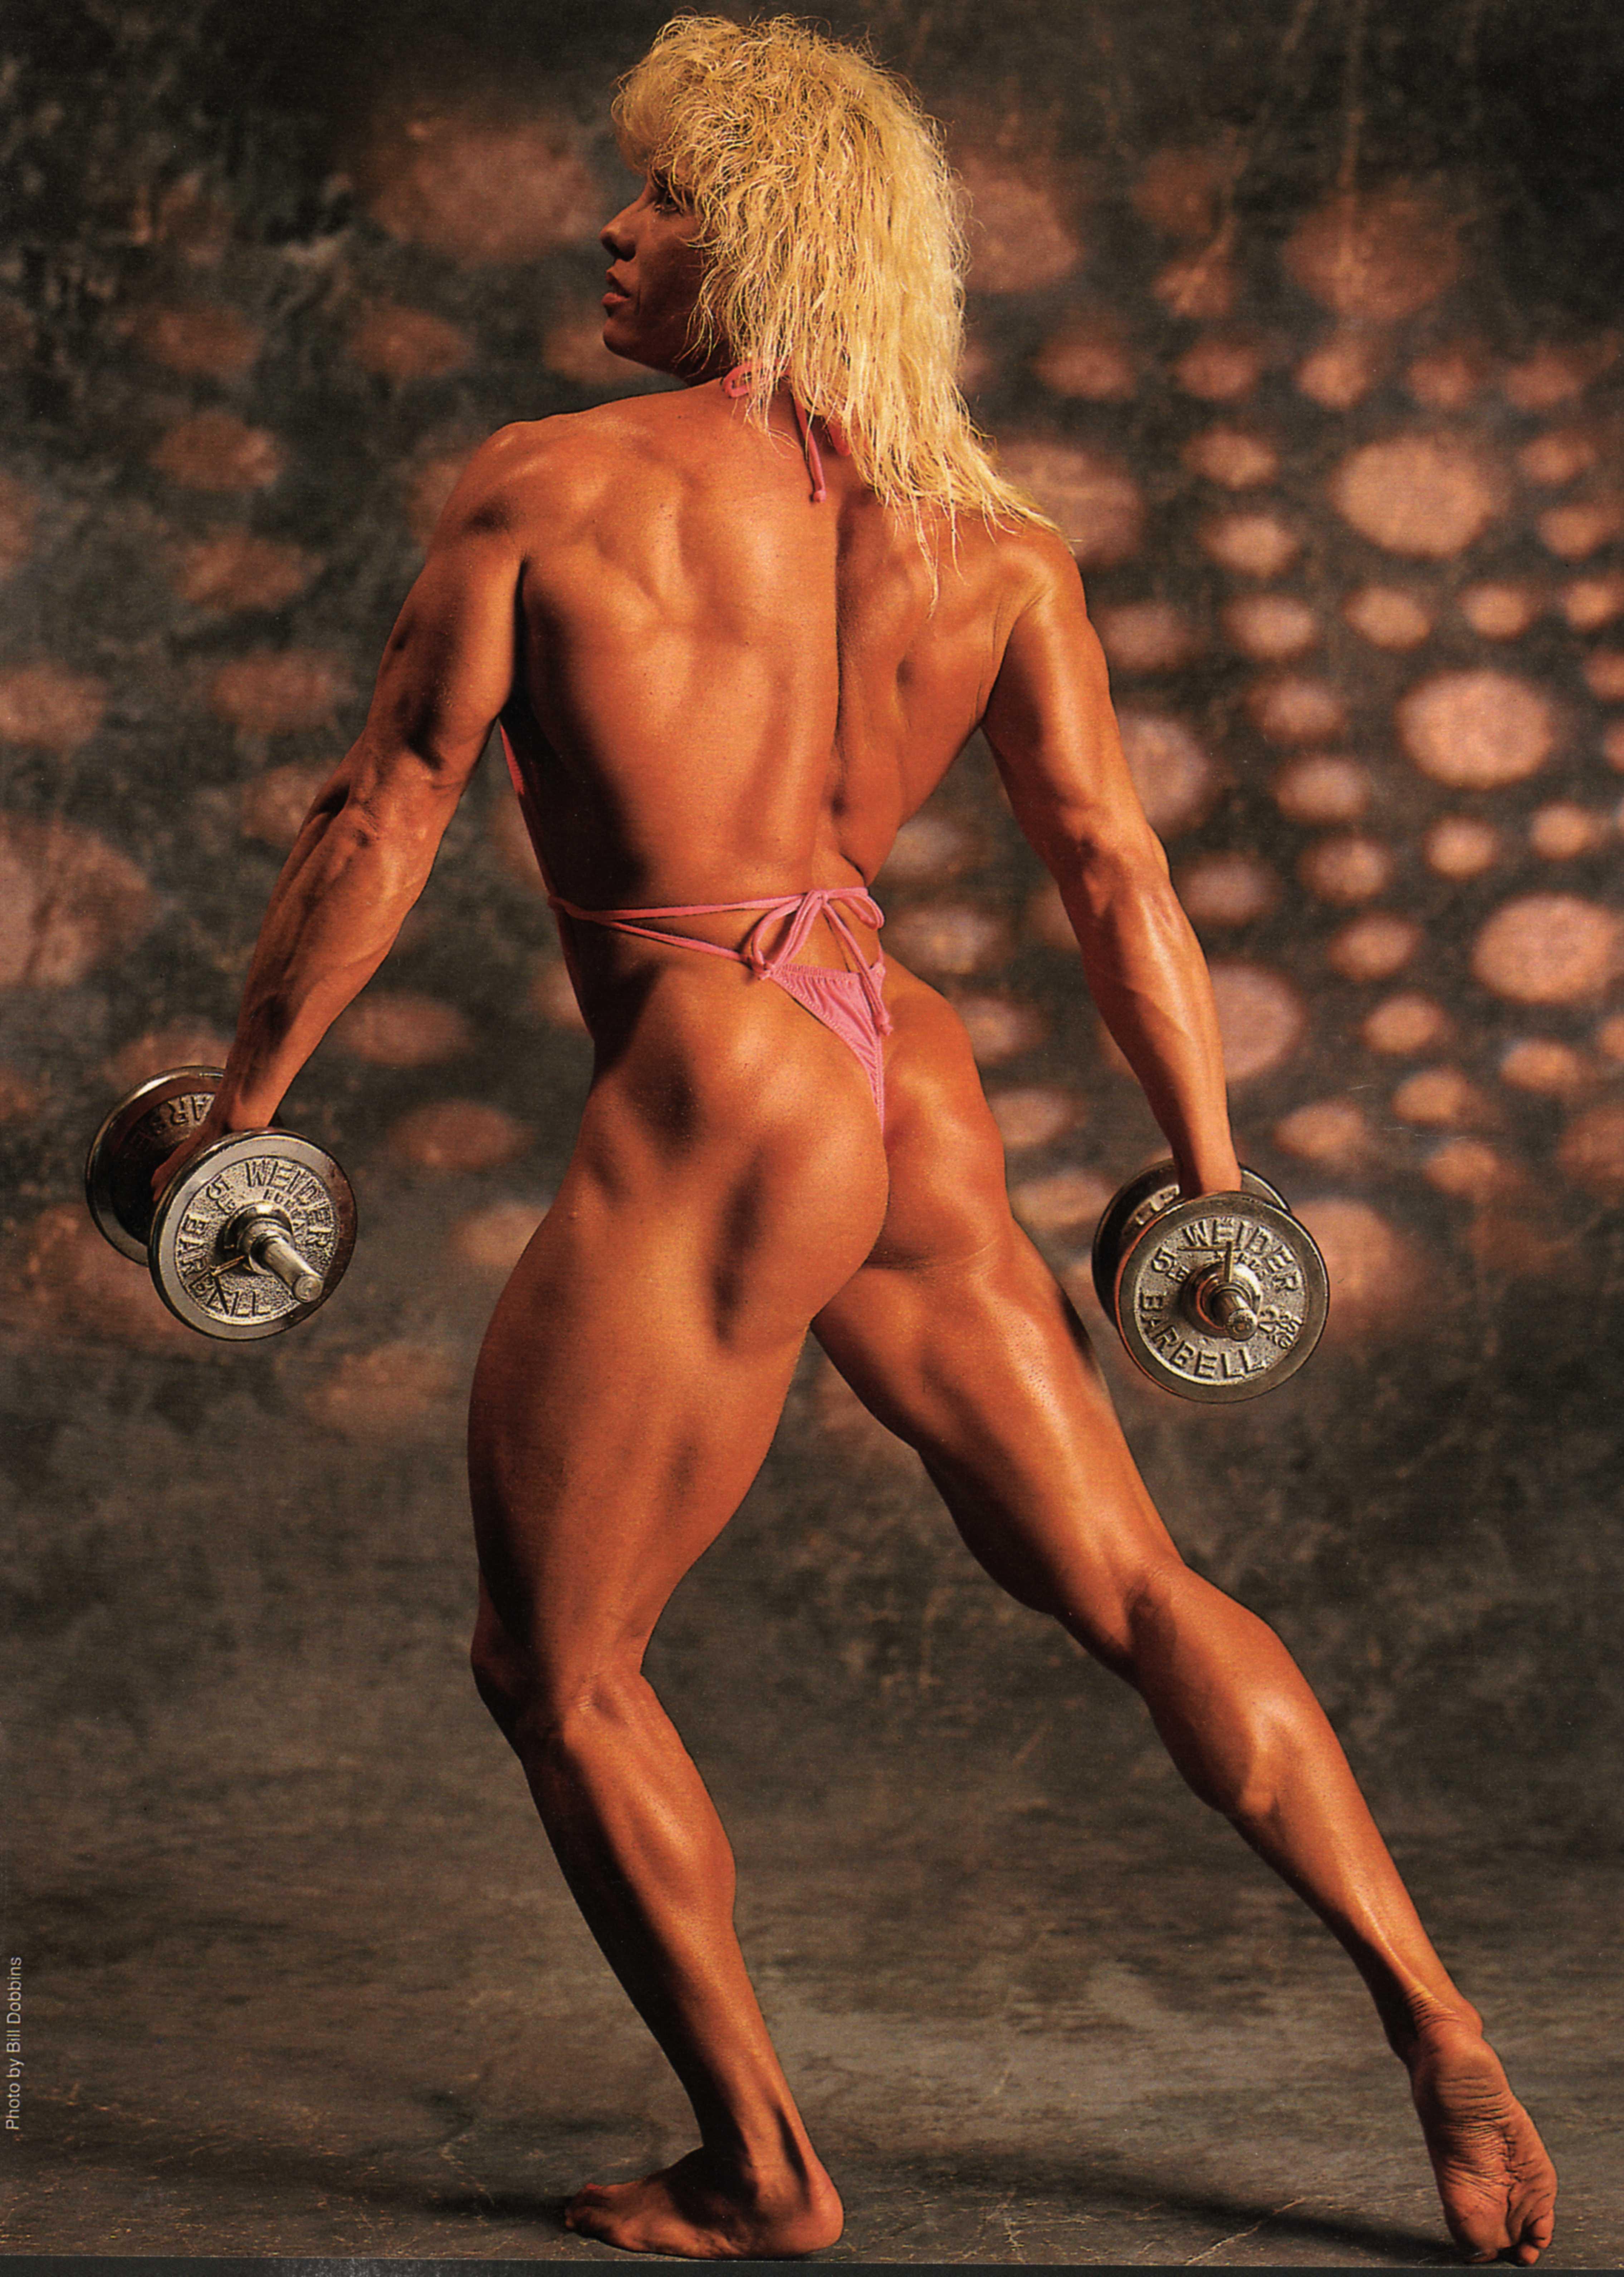 Camelia Somers,Karen Duffy Erotic archive Alyssa Alano (b. 1987),Park Overall